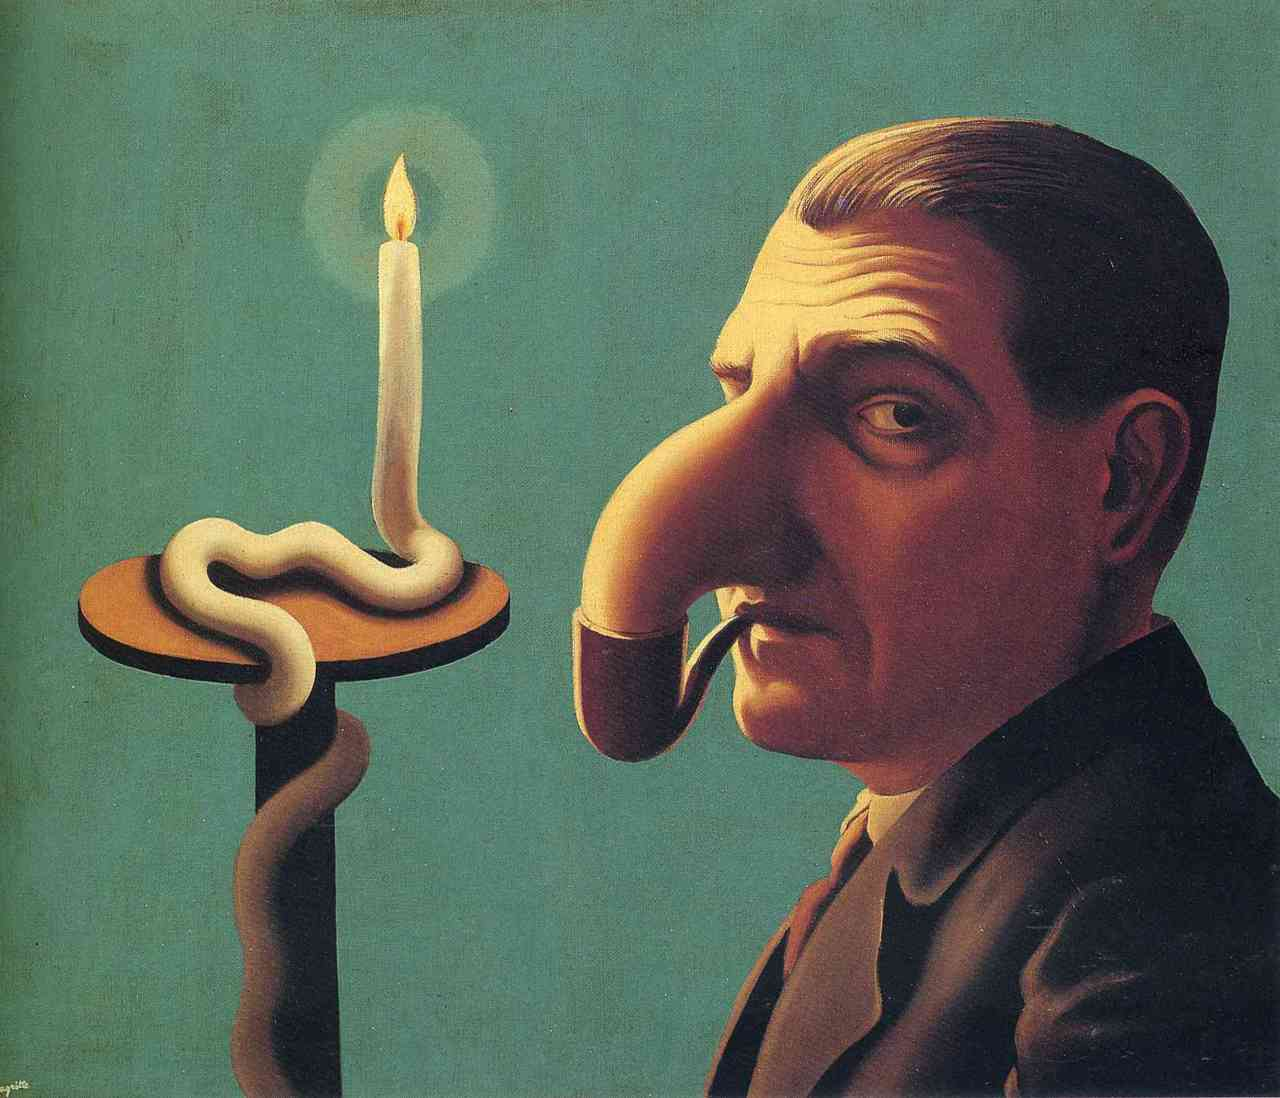 The Philosopher's Lamp